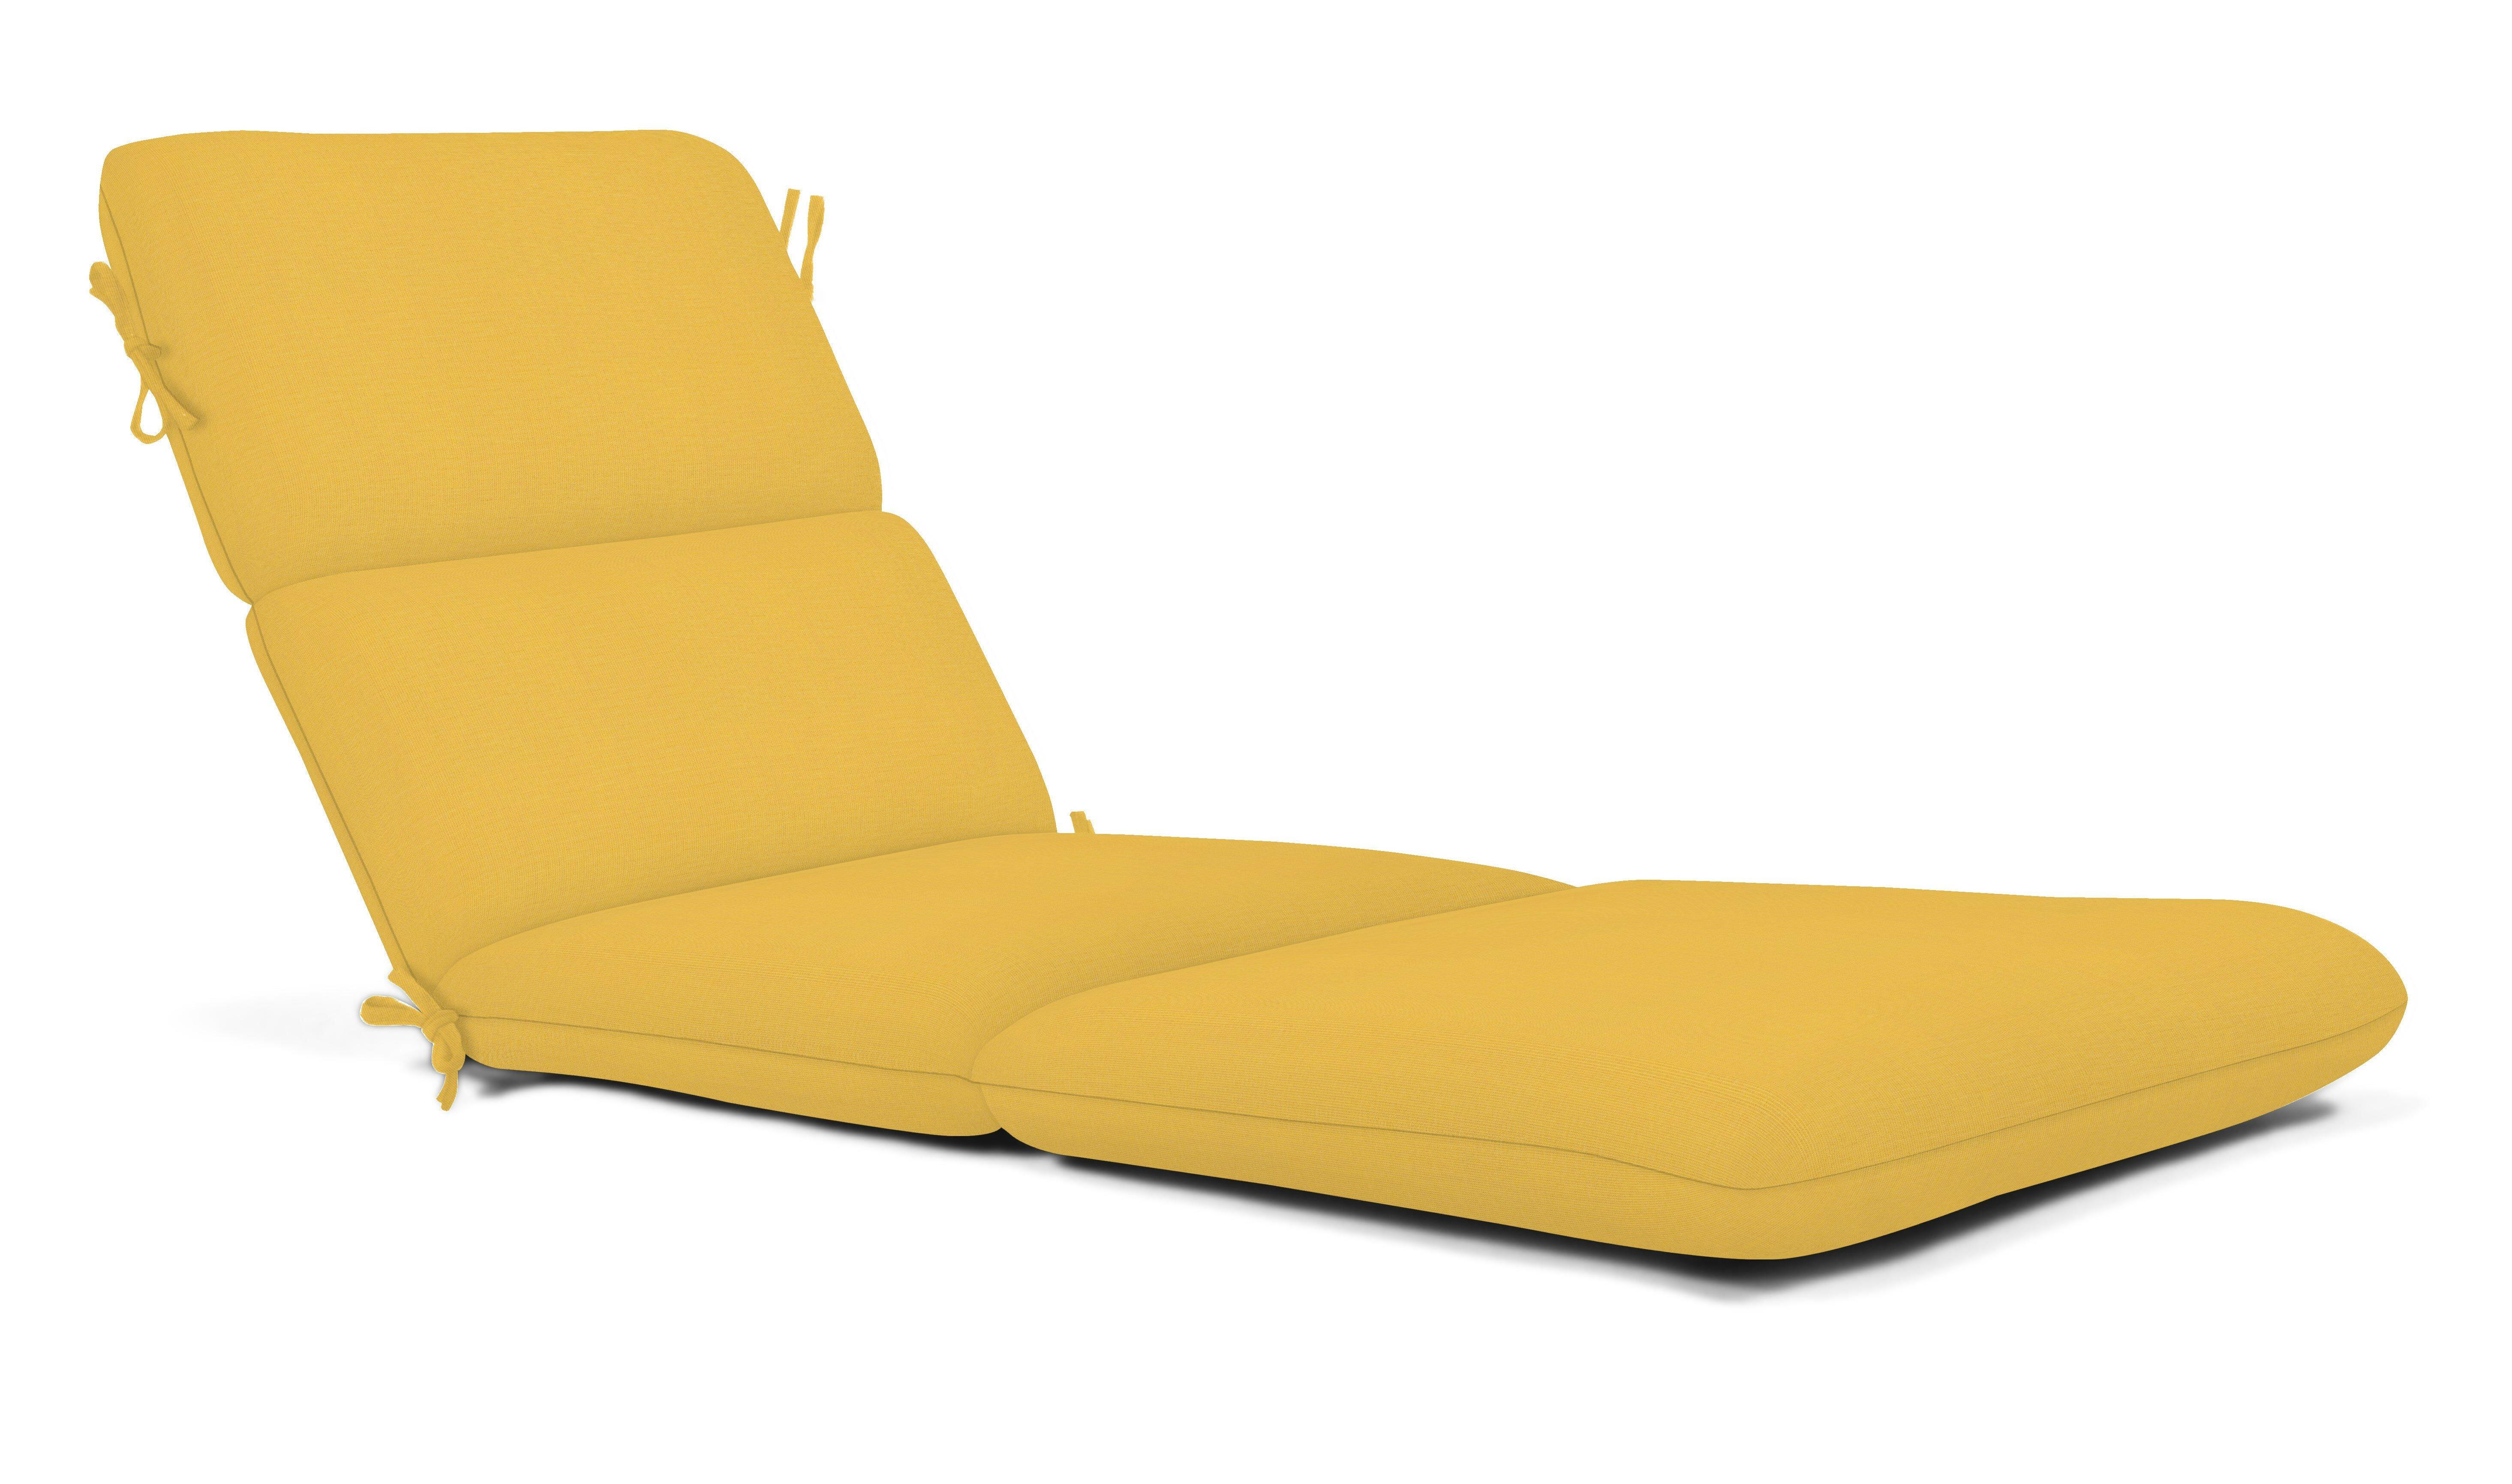 Yellow Patio Furniture Cushions You Ll Love In 2020 Wayfair